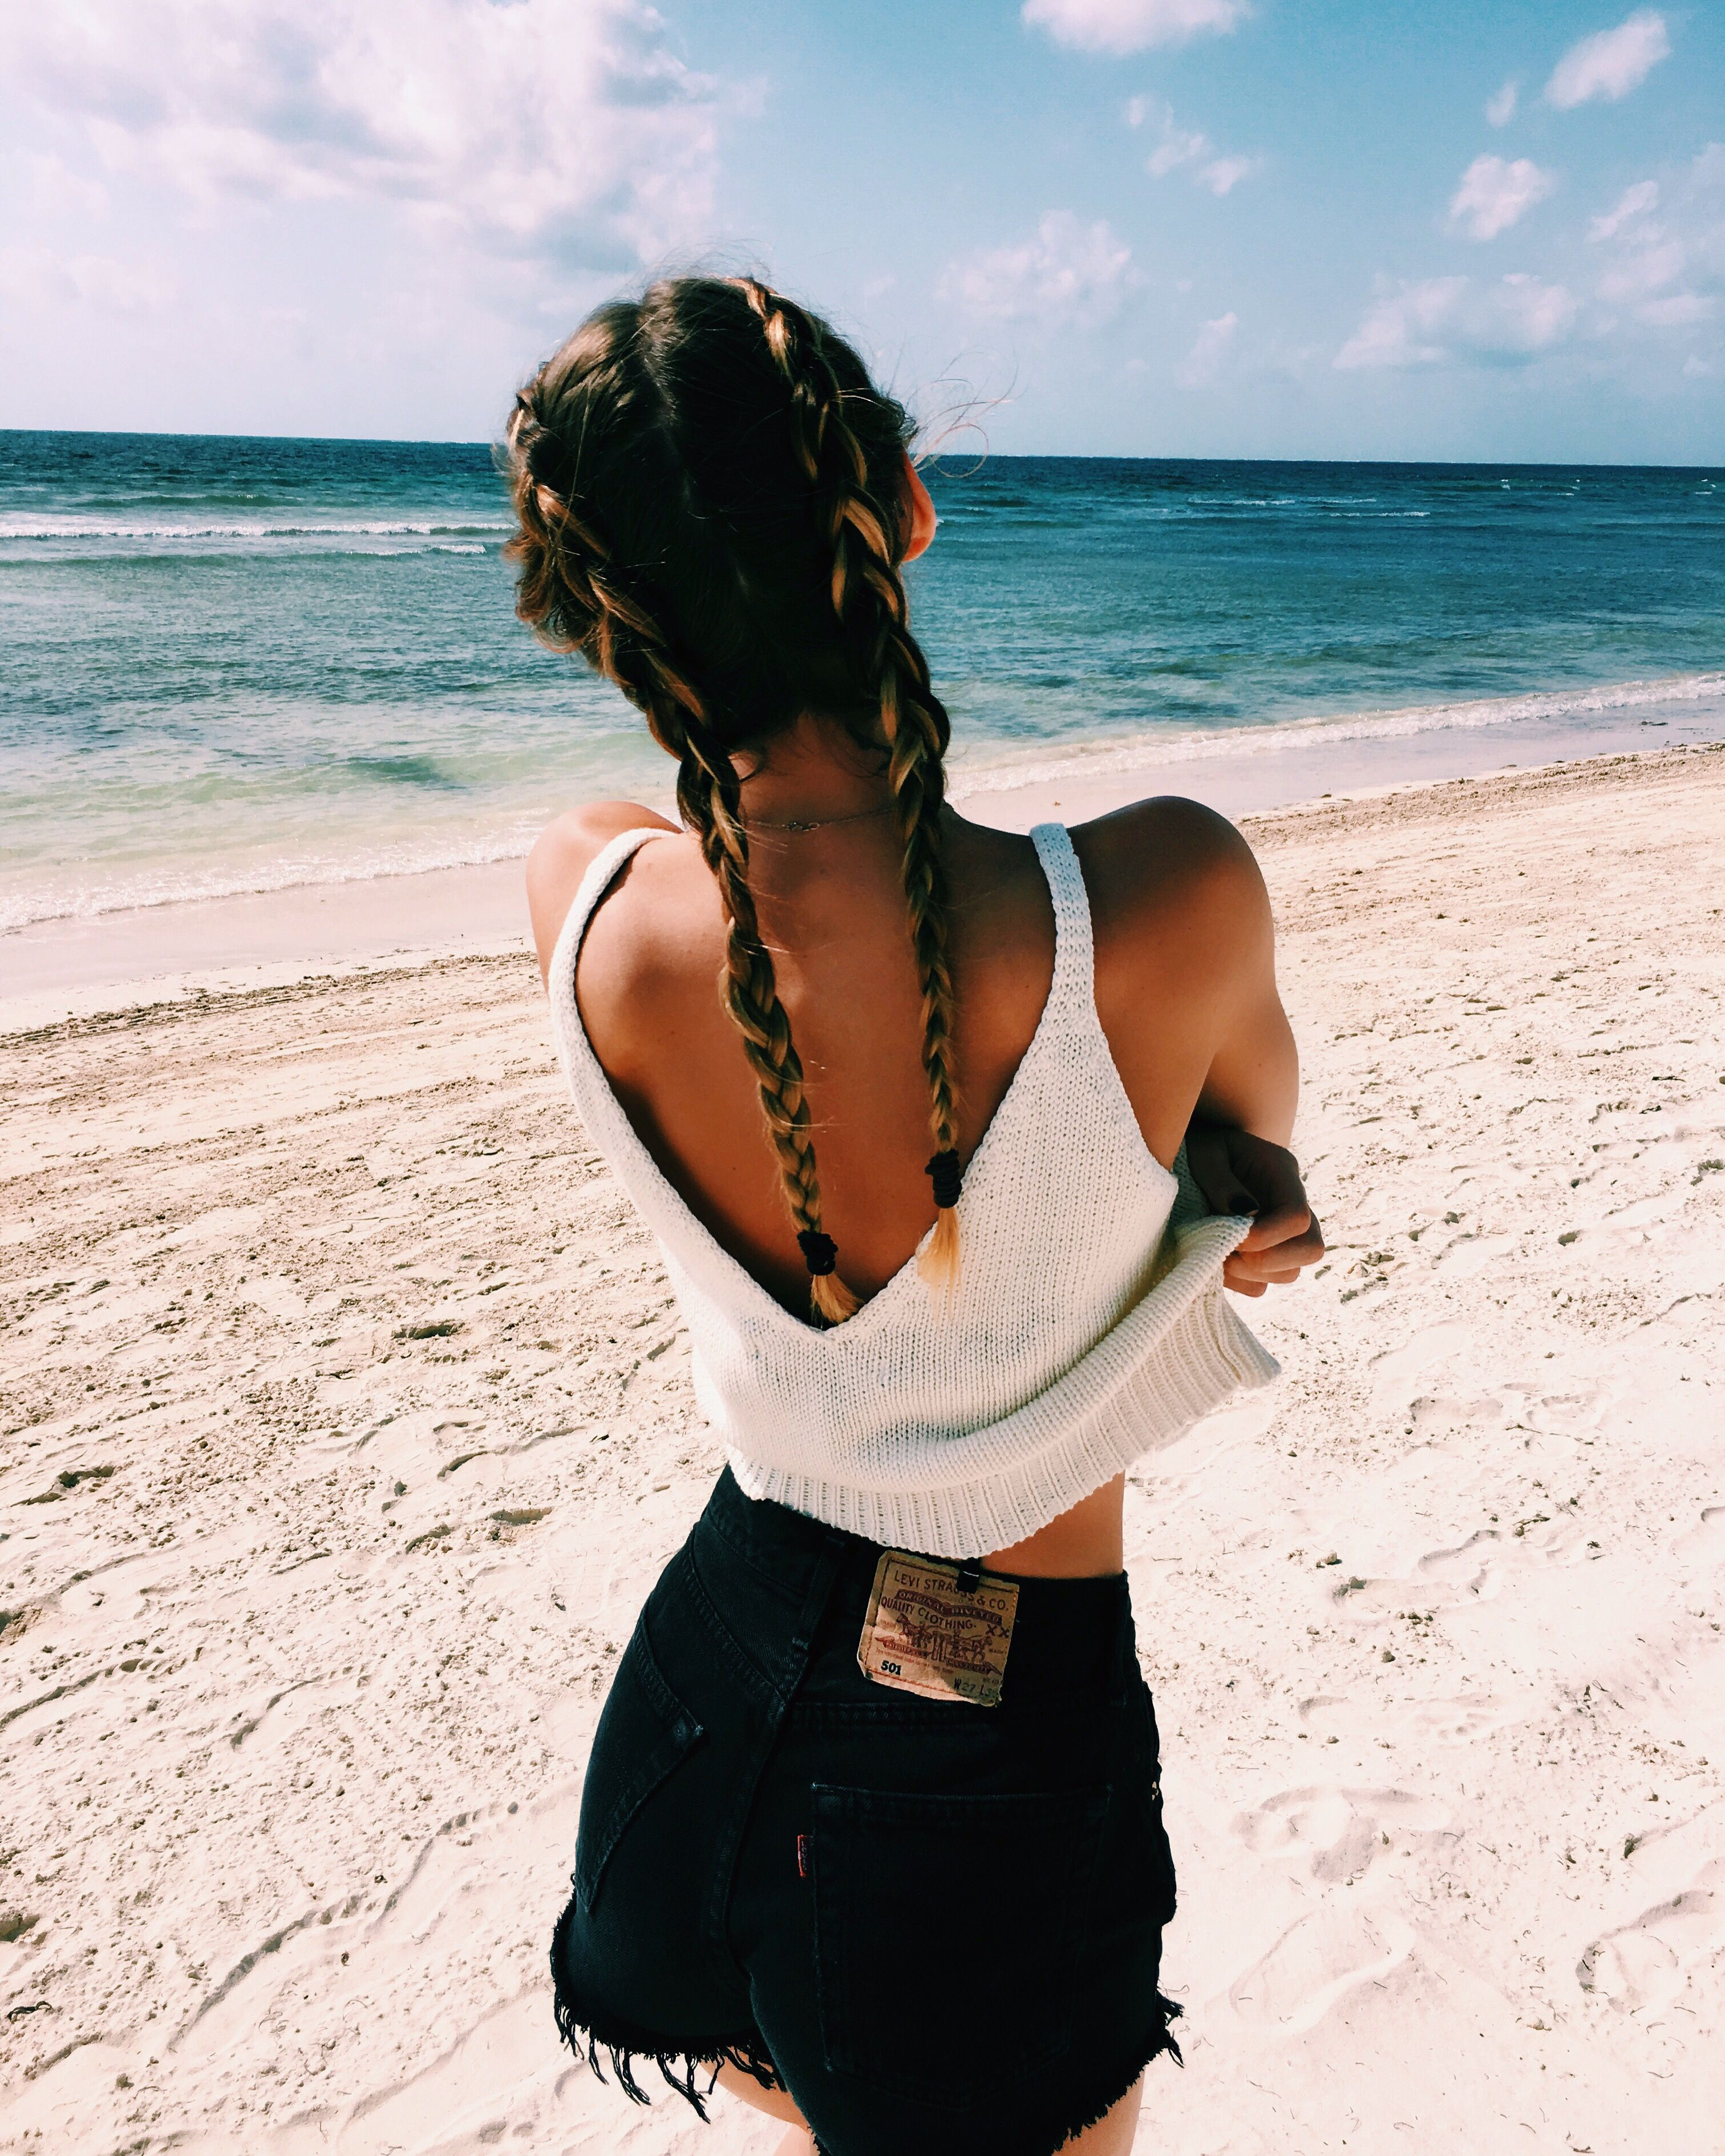 Bali Body Natural Skincare And Tanning Range United States Charlottegrac3